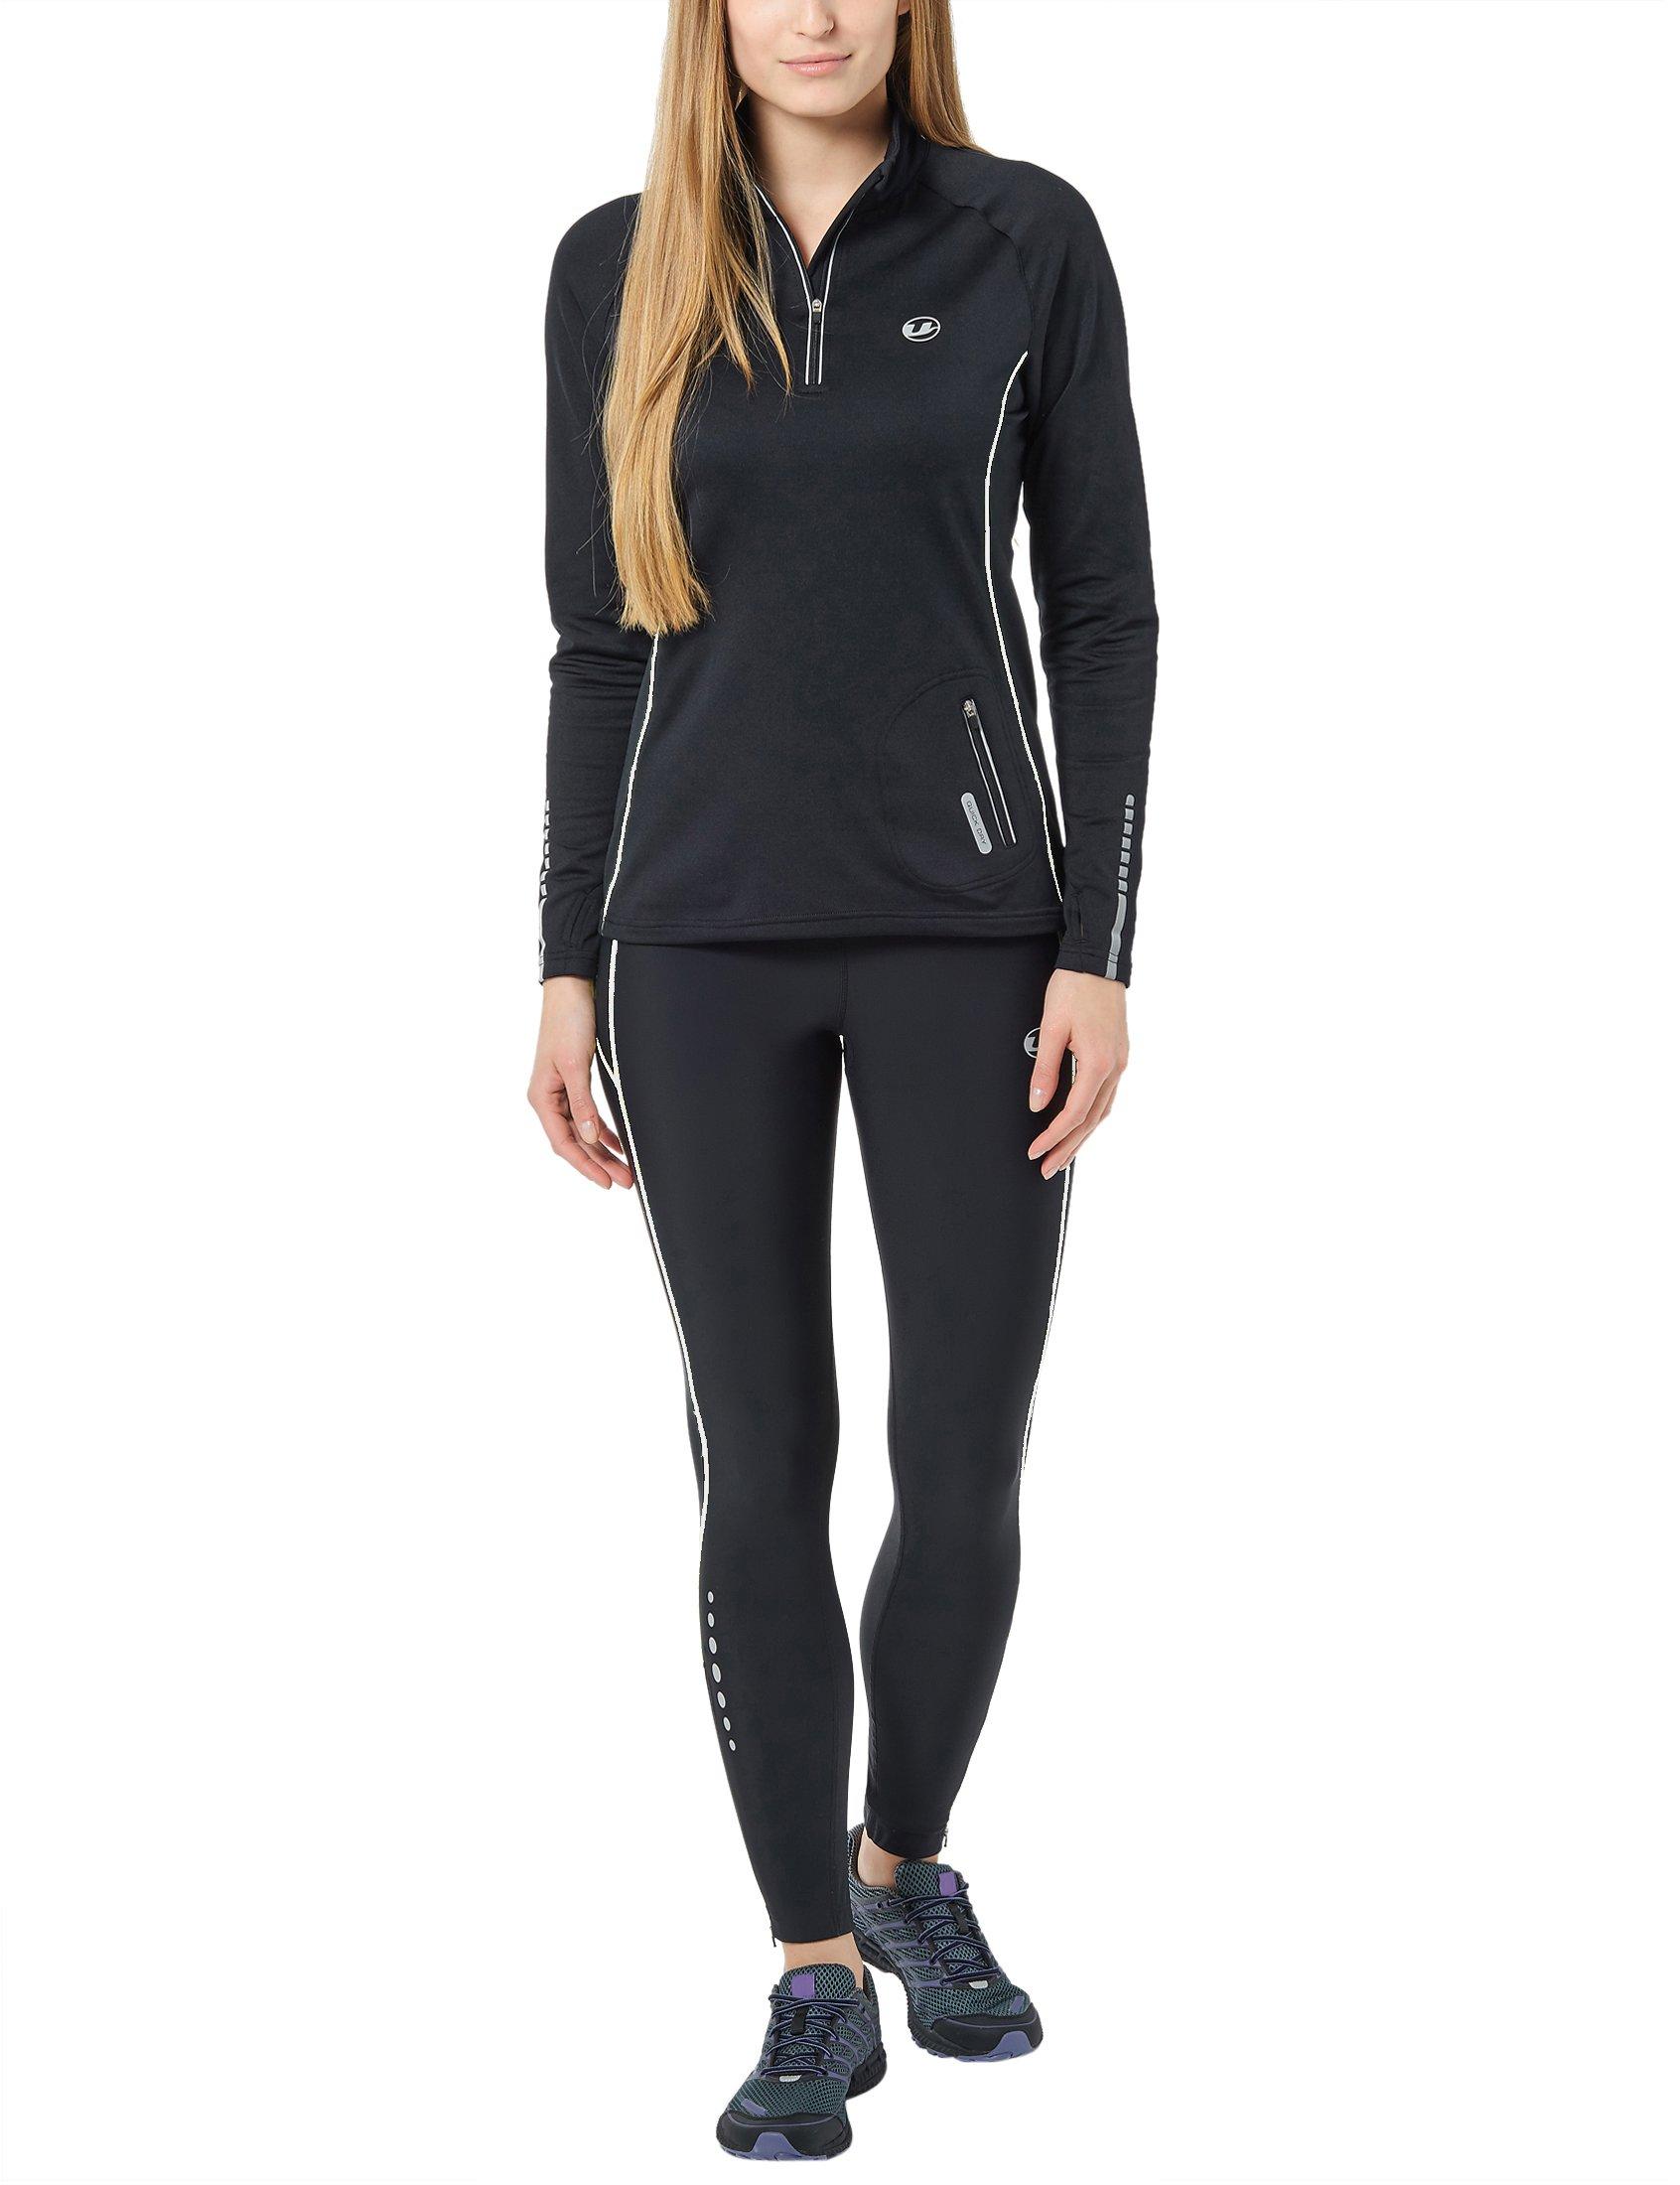 a9f8bfd55a899 Ultrasport pantalon de course femme, long avec effet de compression ...